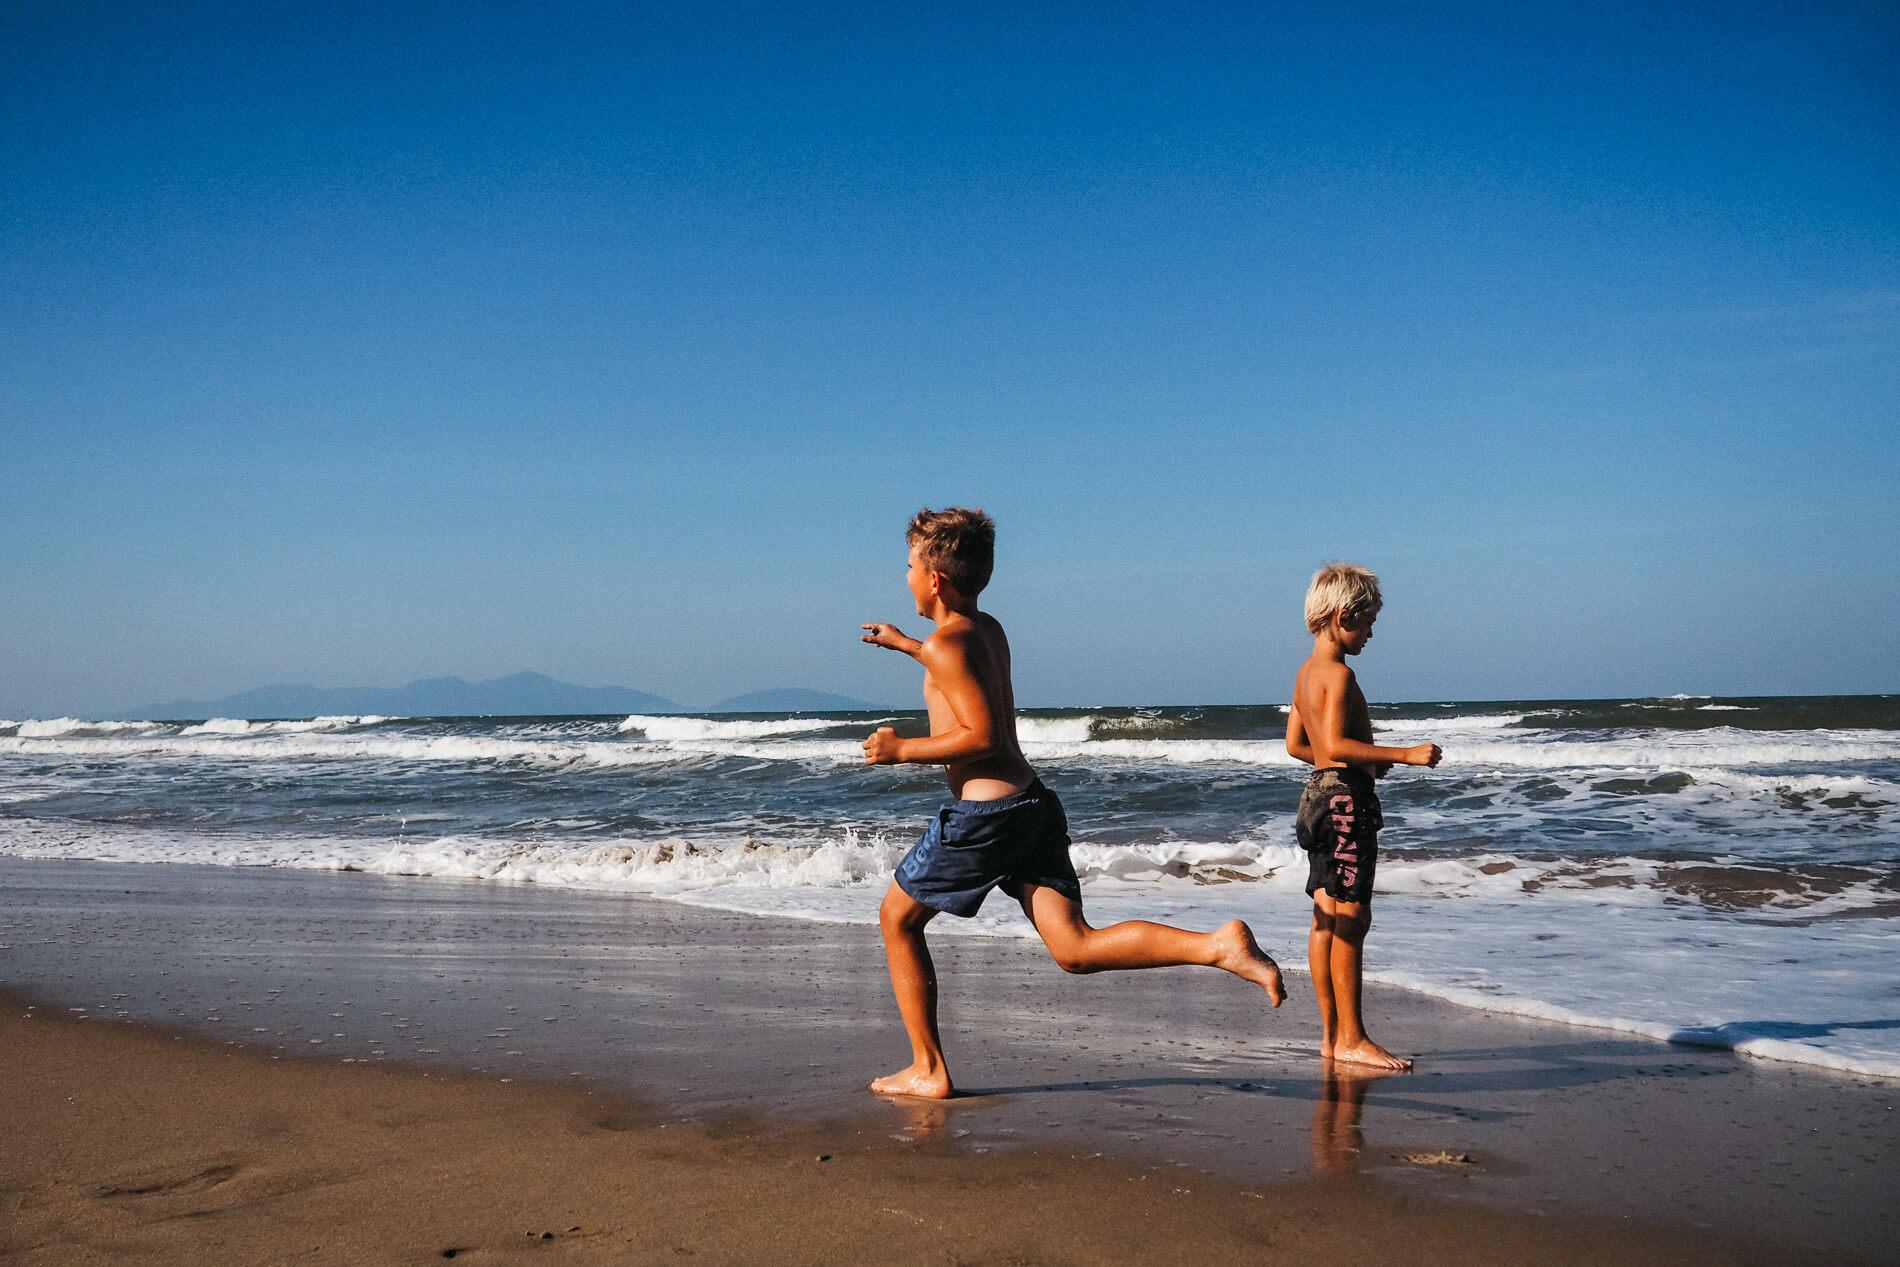 boys play in the surf along Da Nang's beach